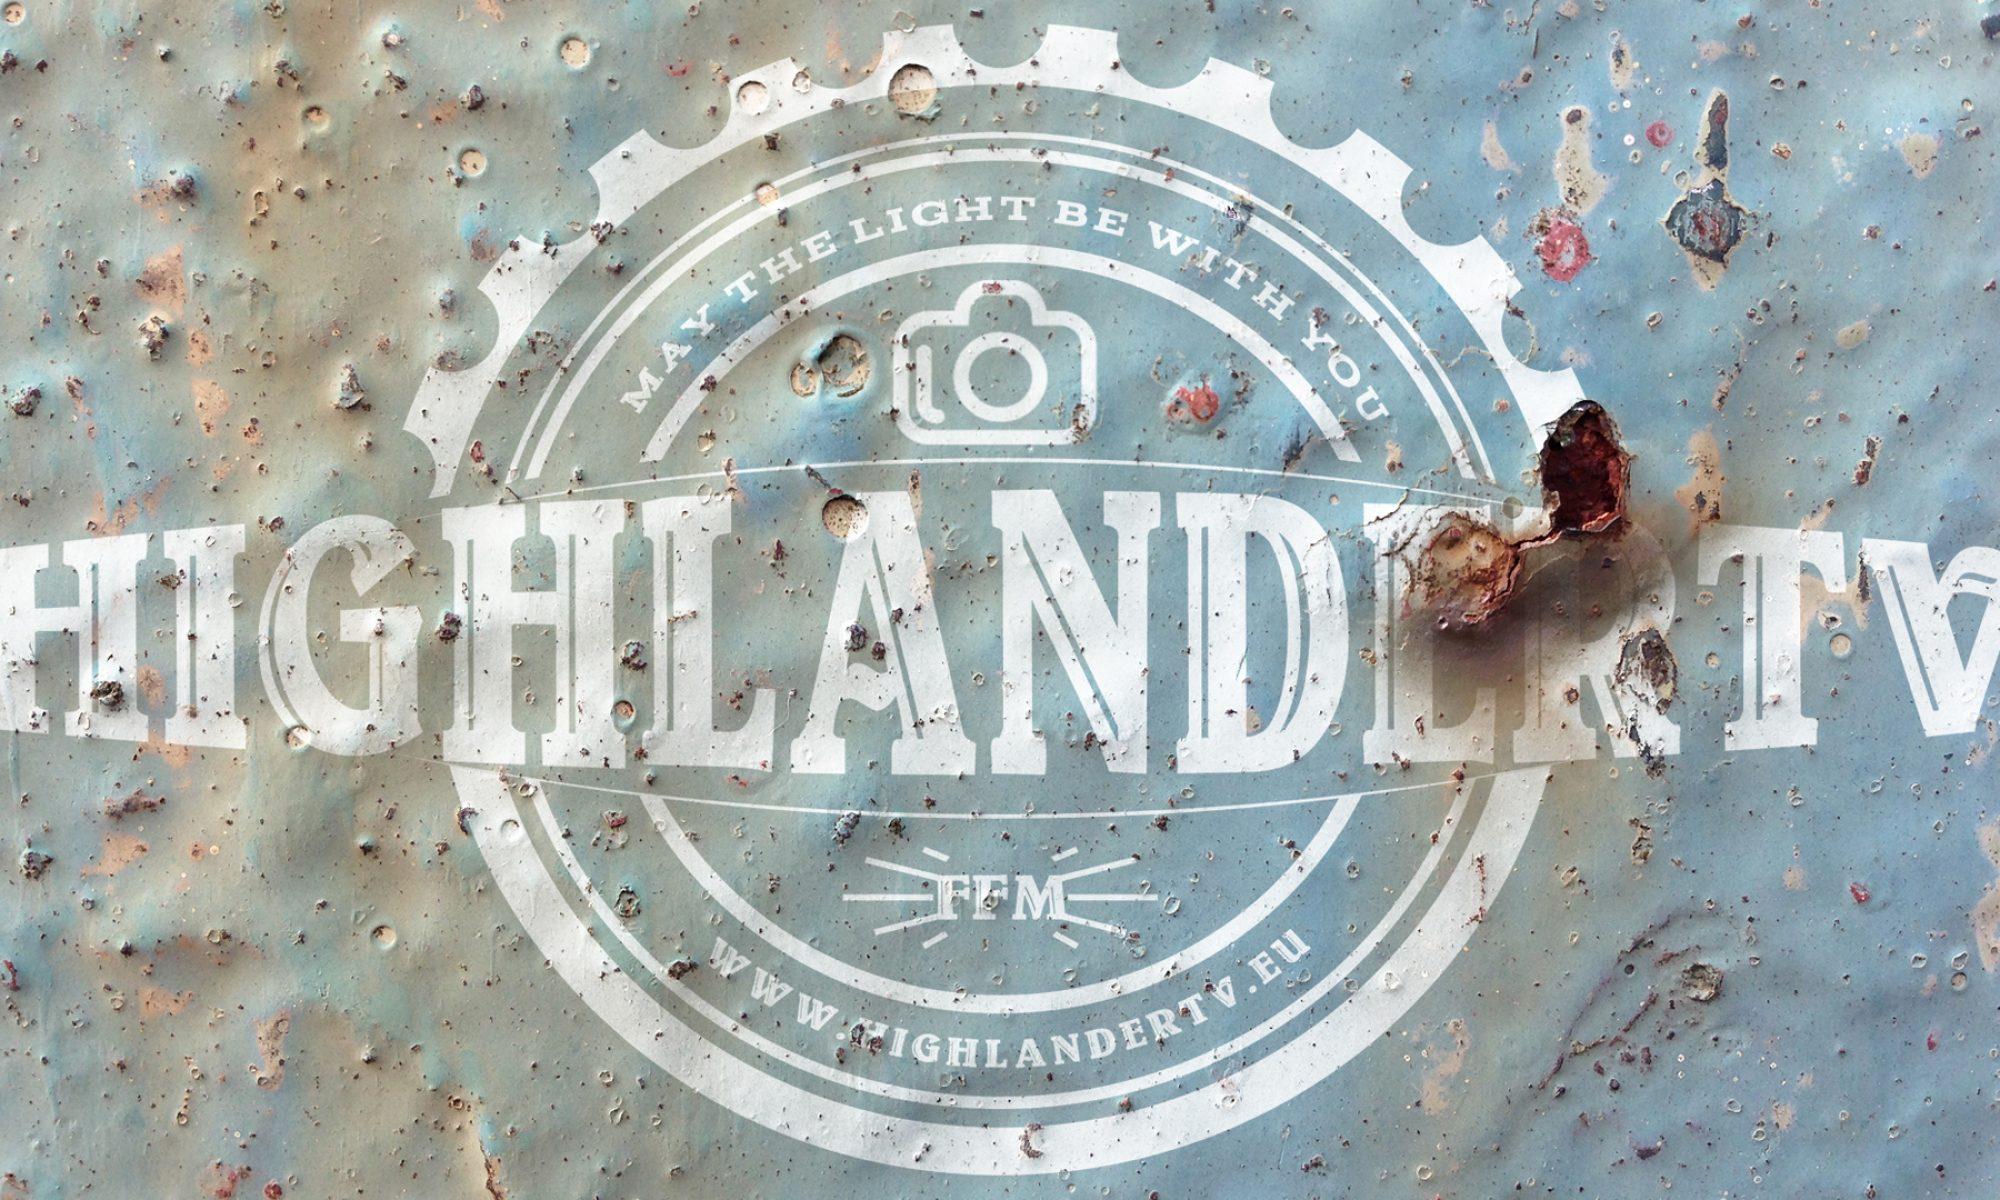 HighlanderTV - Ihr Fotograf in Frankfurt am Main